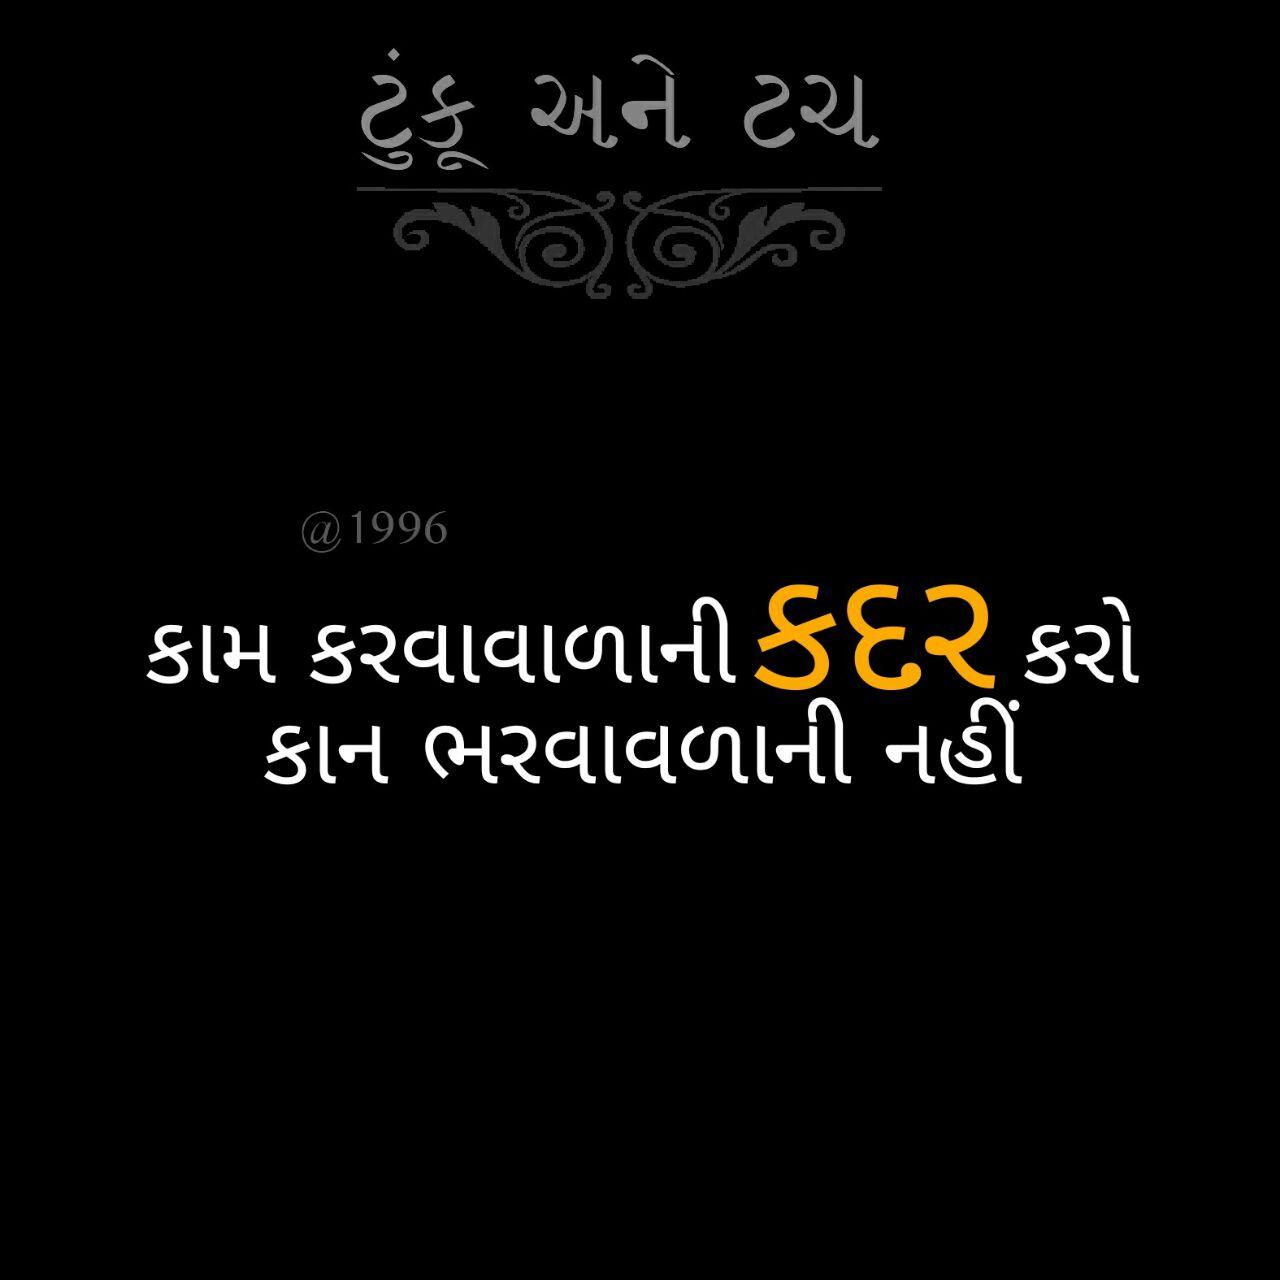 Best-Gujarati-Suvichar-images-in-2020-32.jpg